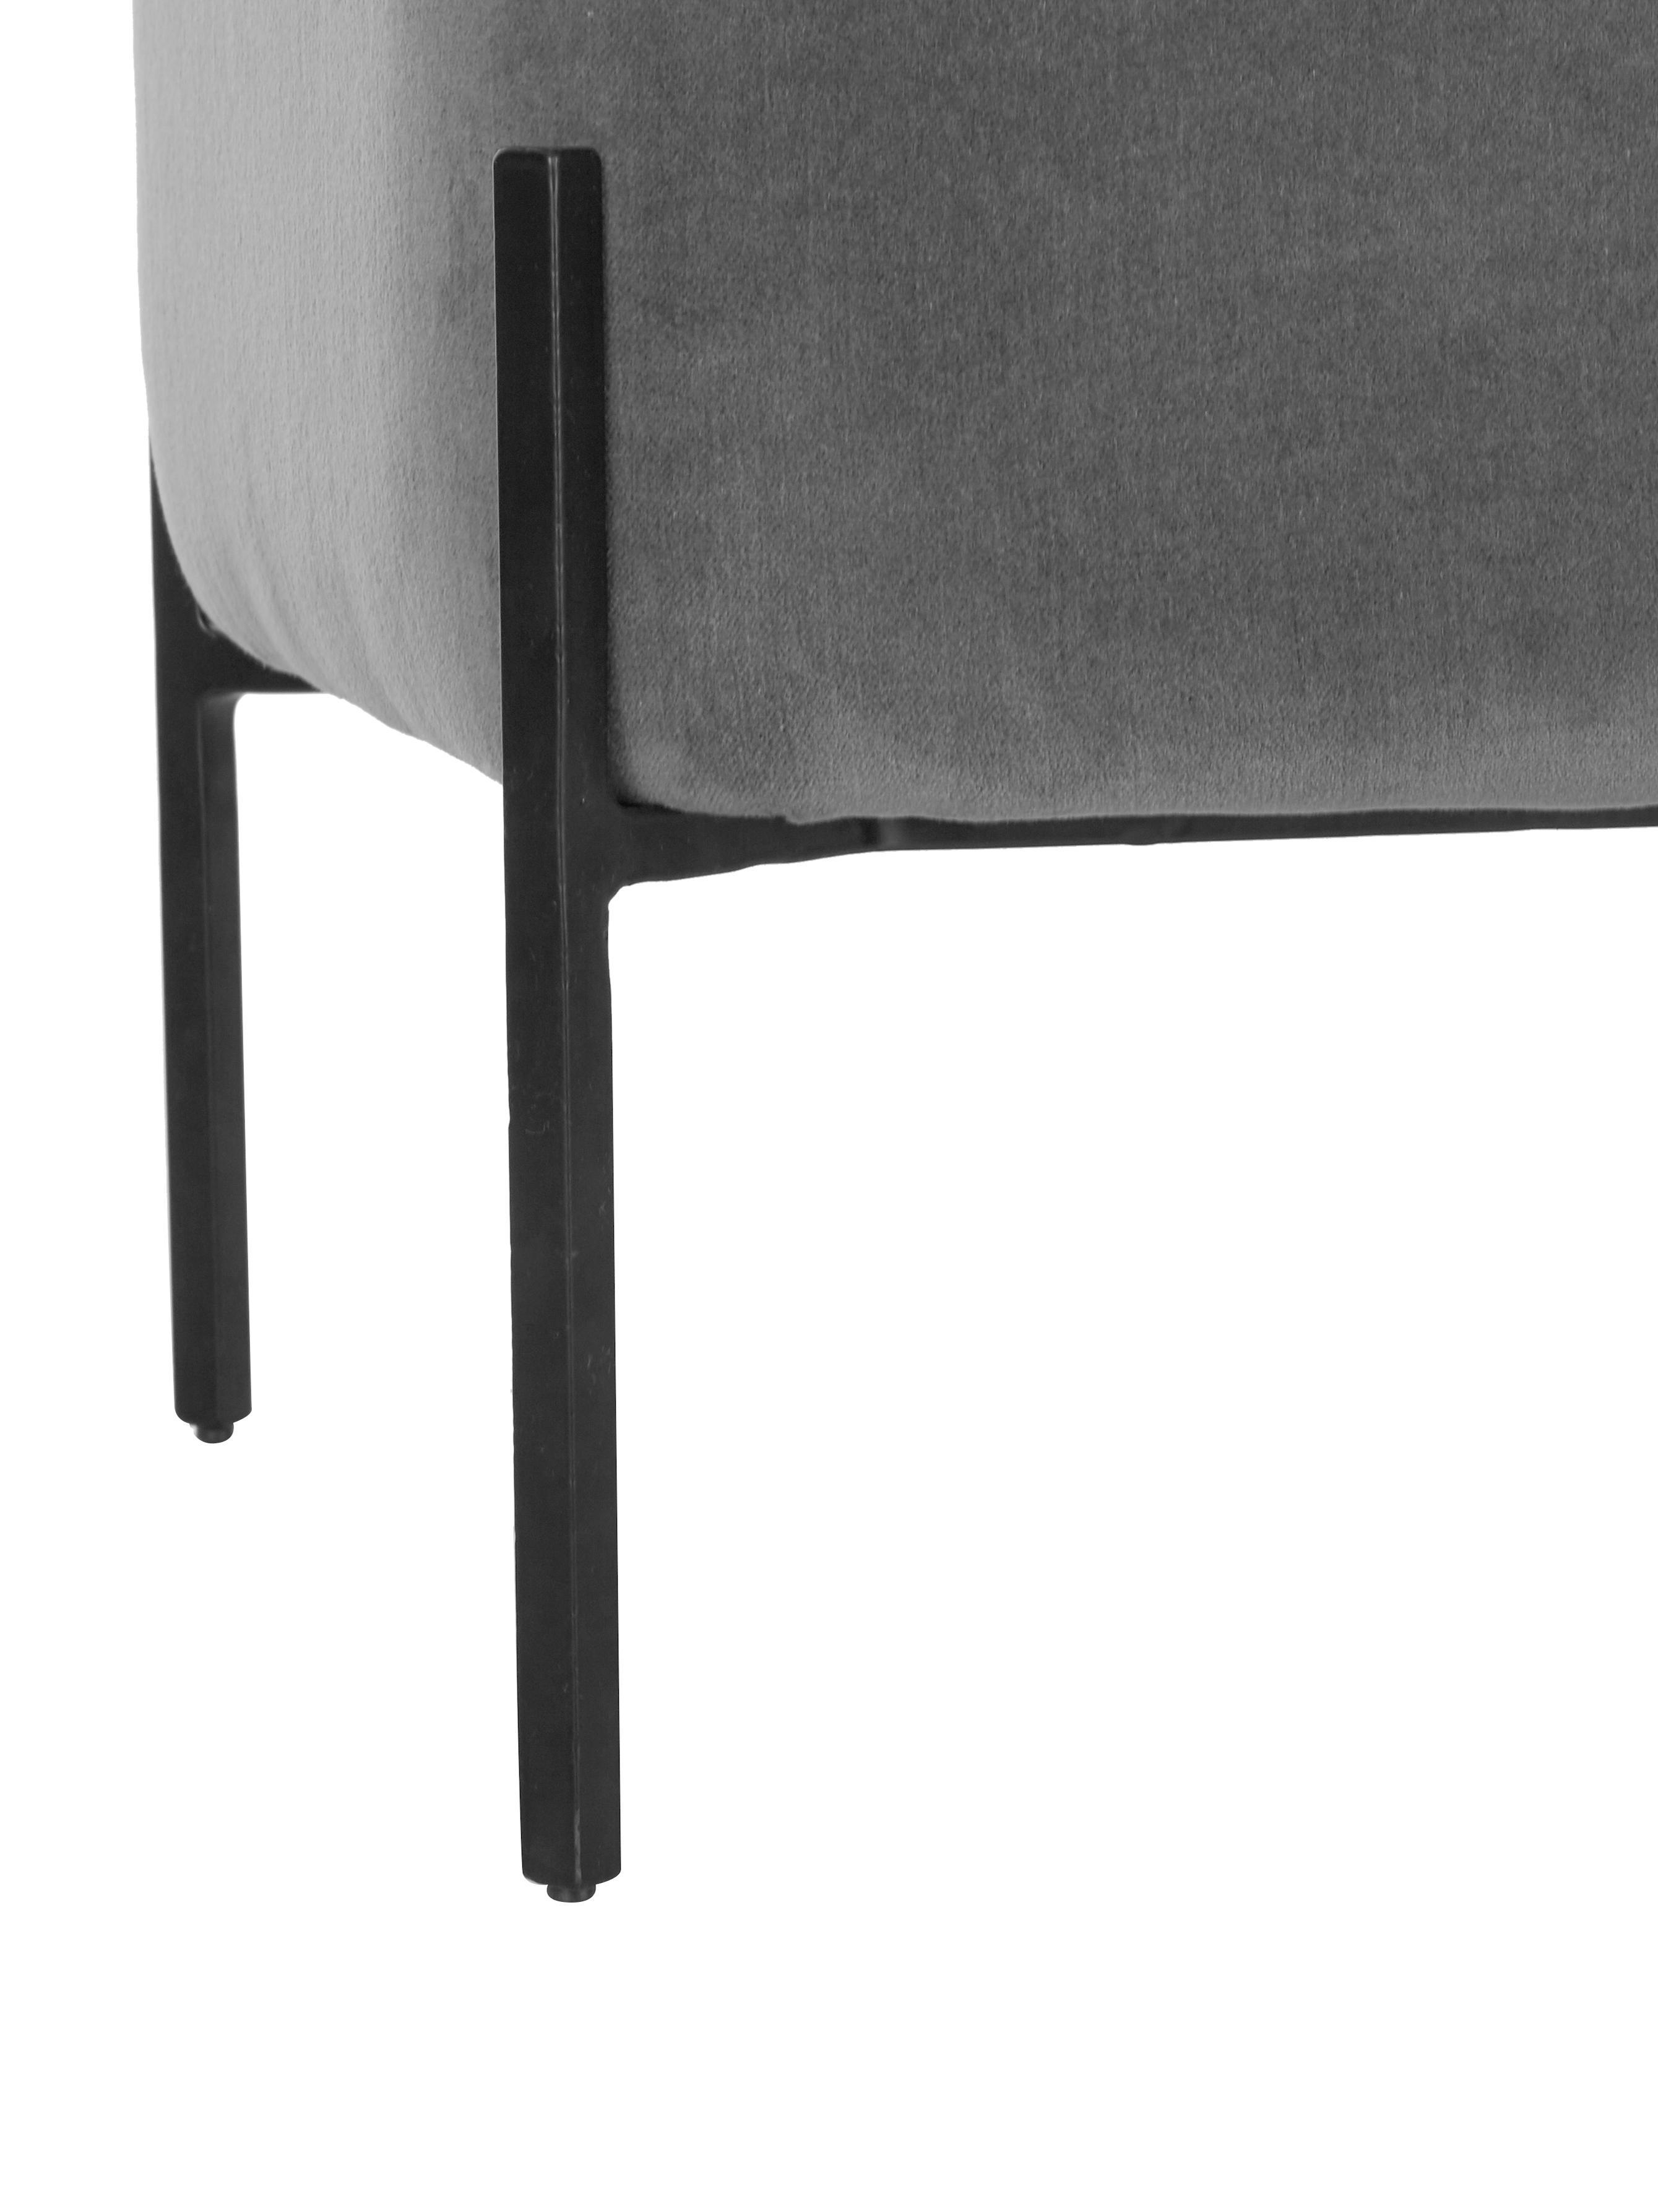 Panca imbottita in velluto Harper, Rivestimento: velluto, Rivestimento: grigio scuro Base: nero opaco, Larg. 140 x Alt. 45 cm